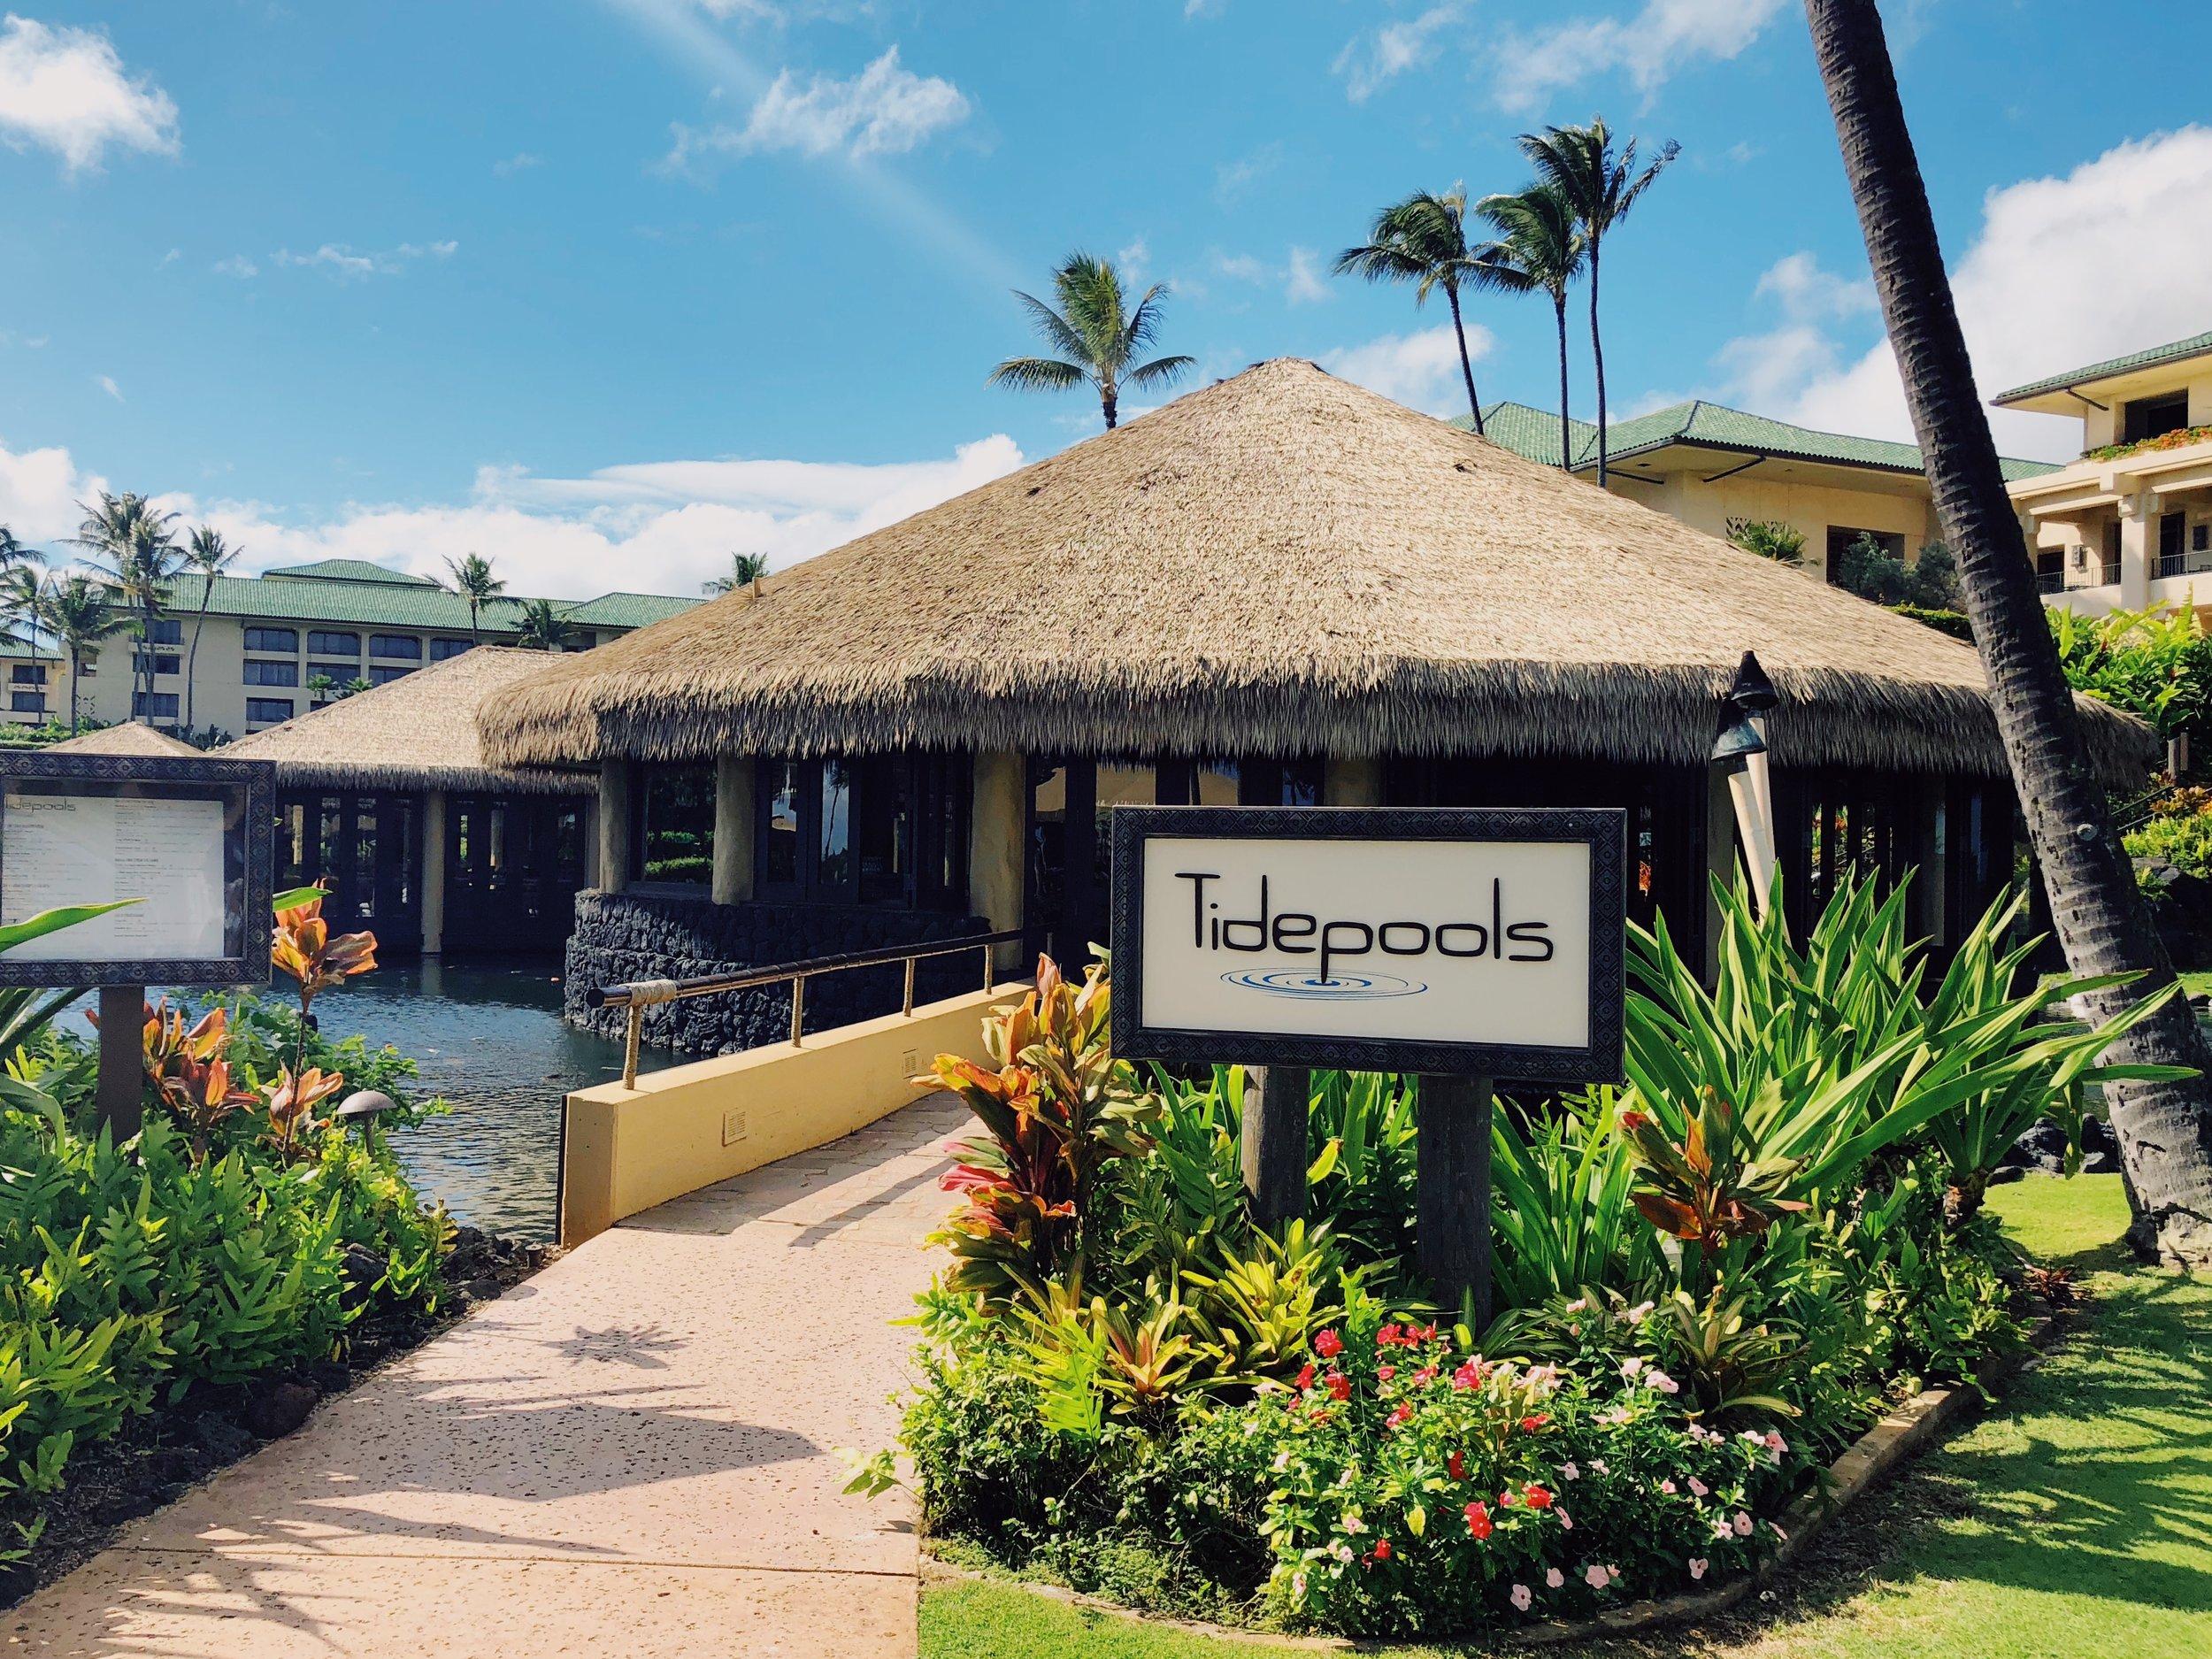 tidepools restaurant at grand hyatt kauai review